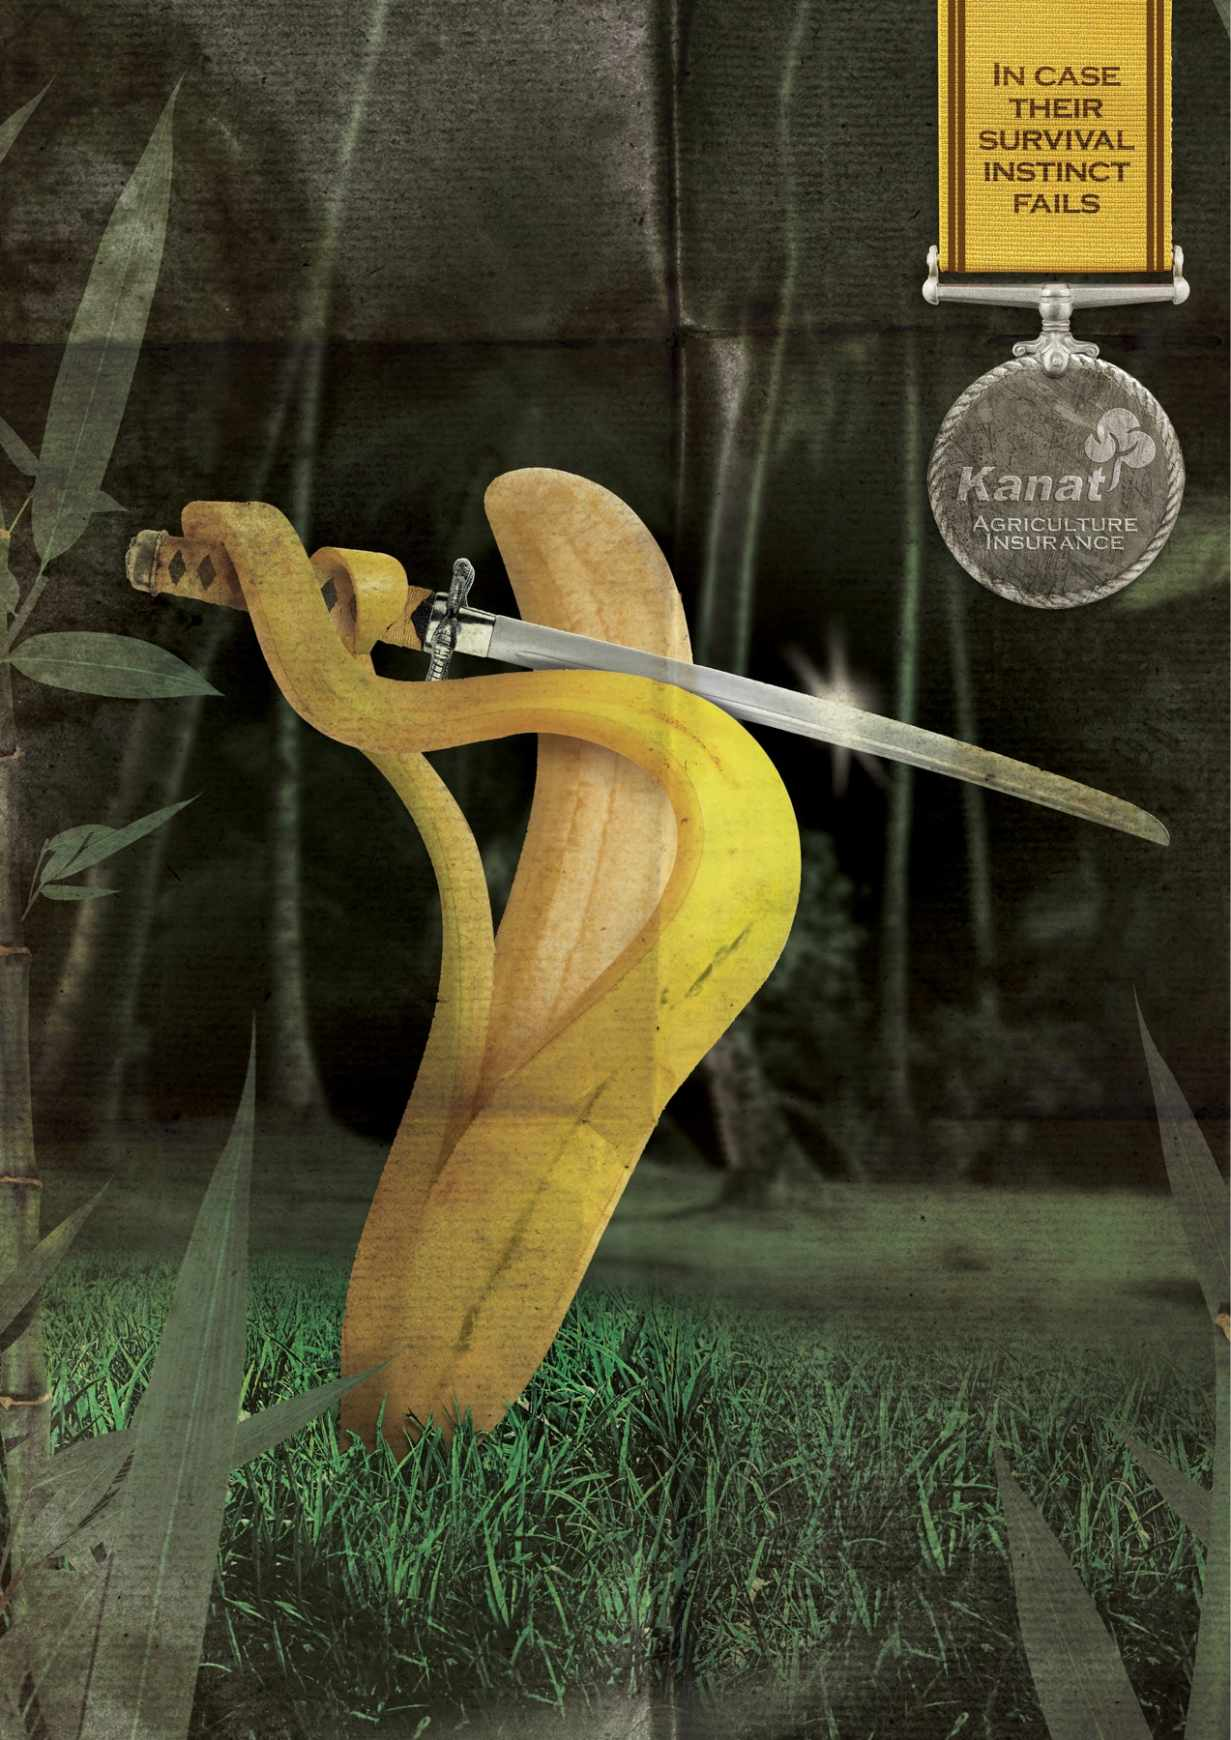 Kanat 农业保险平面创意广告设计香蕉篇-上海尚略广告设计公司平面广告分享